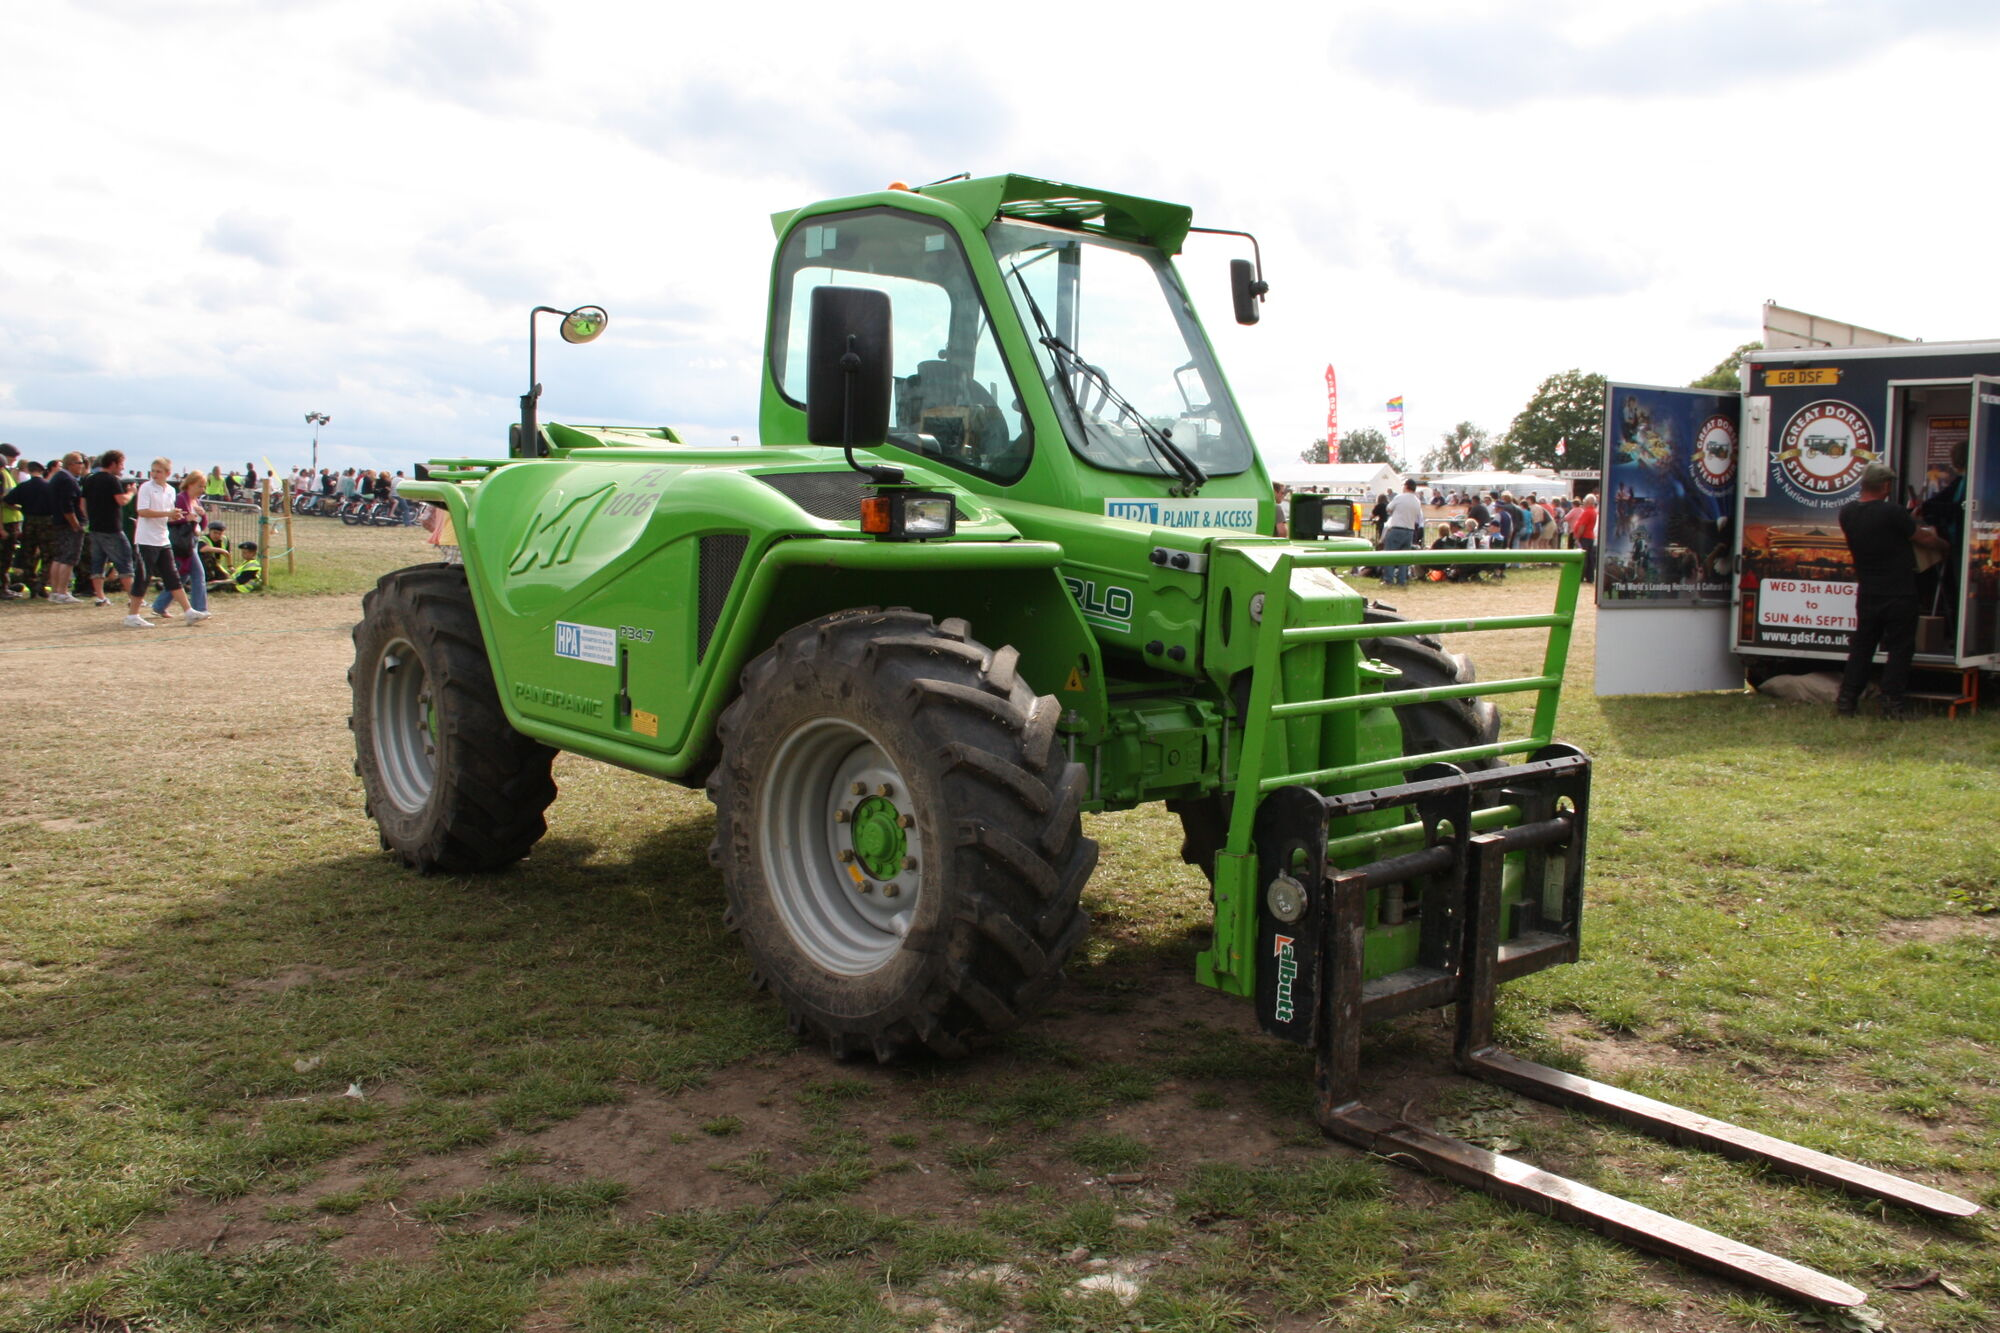 Albutt tractor construction plant wiki fandom powered by wikia - Porter international wiki ...